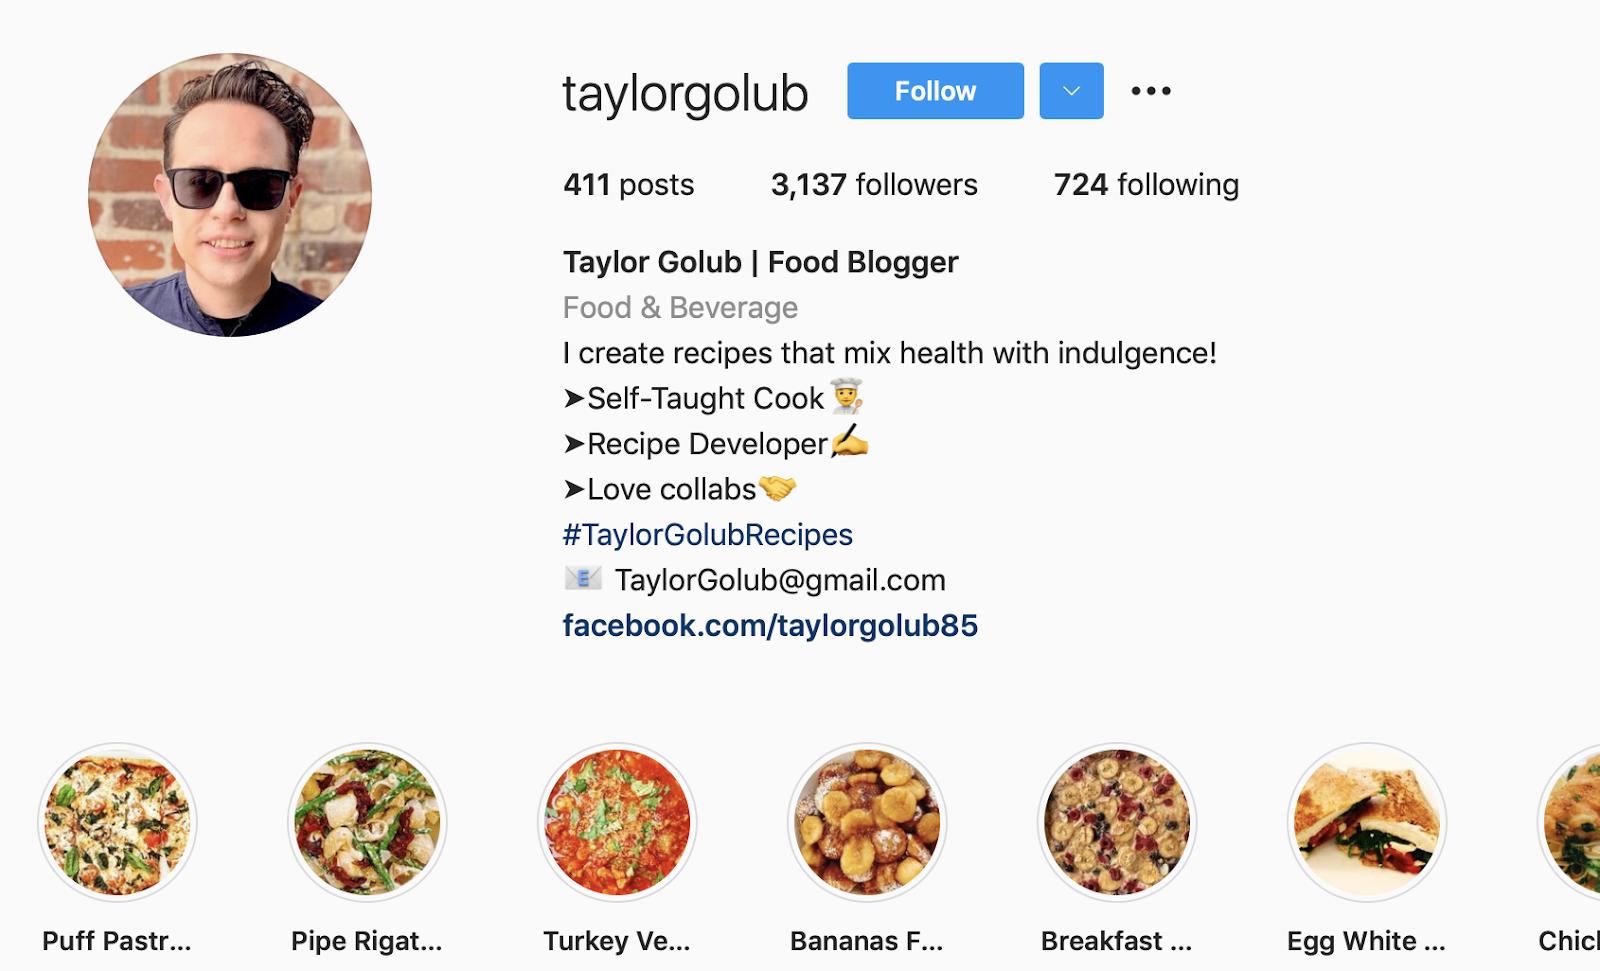 Taylor Golub | Food & Beverage Microinfluencer | Instagram Bio